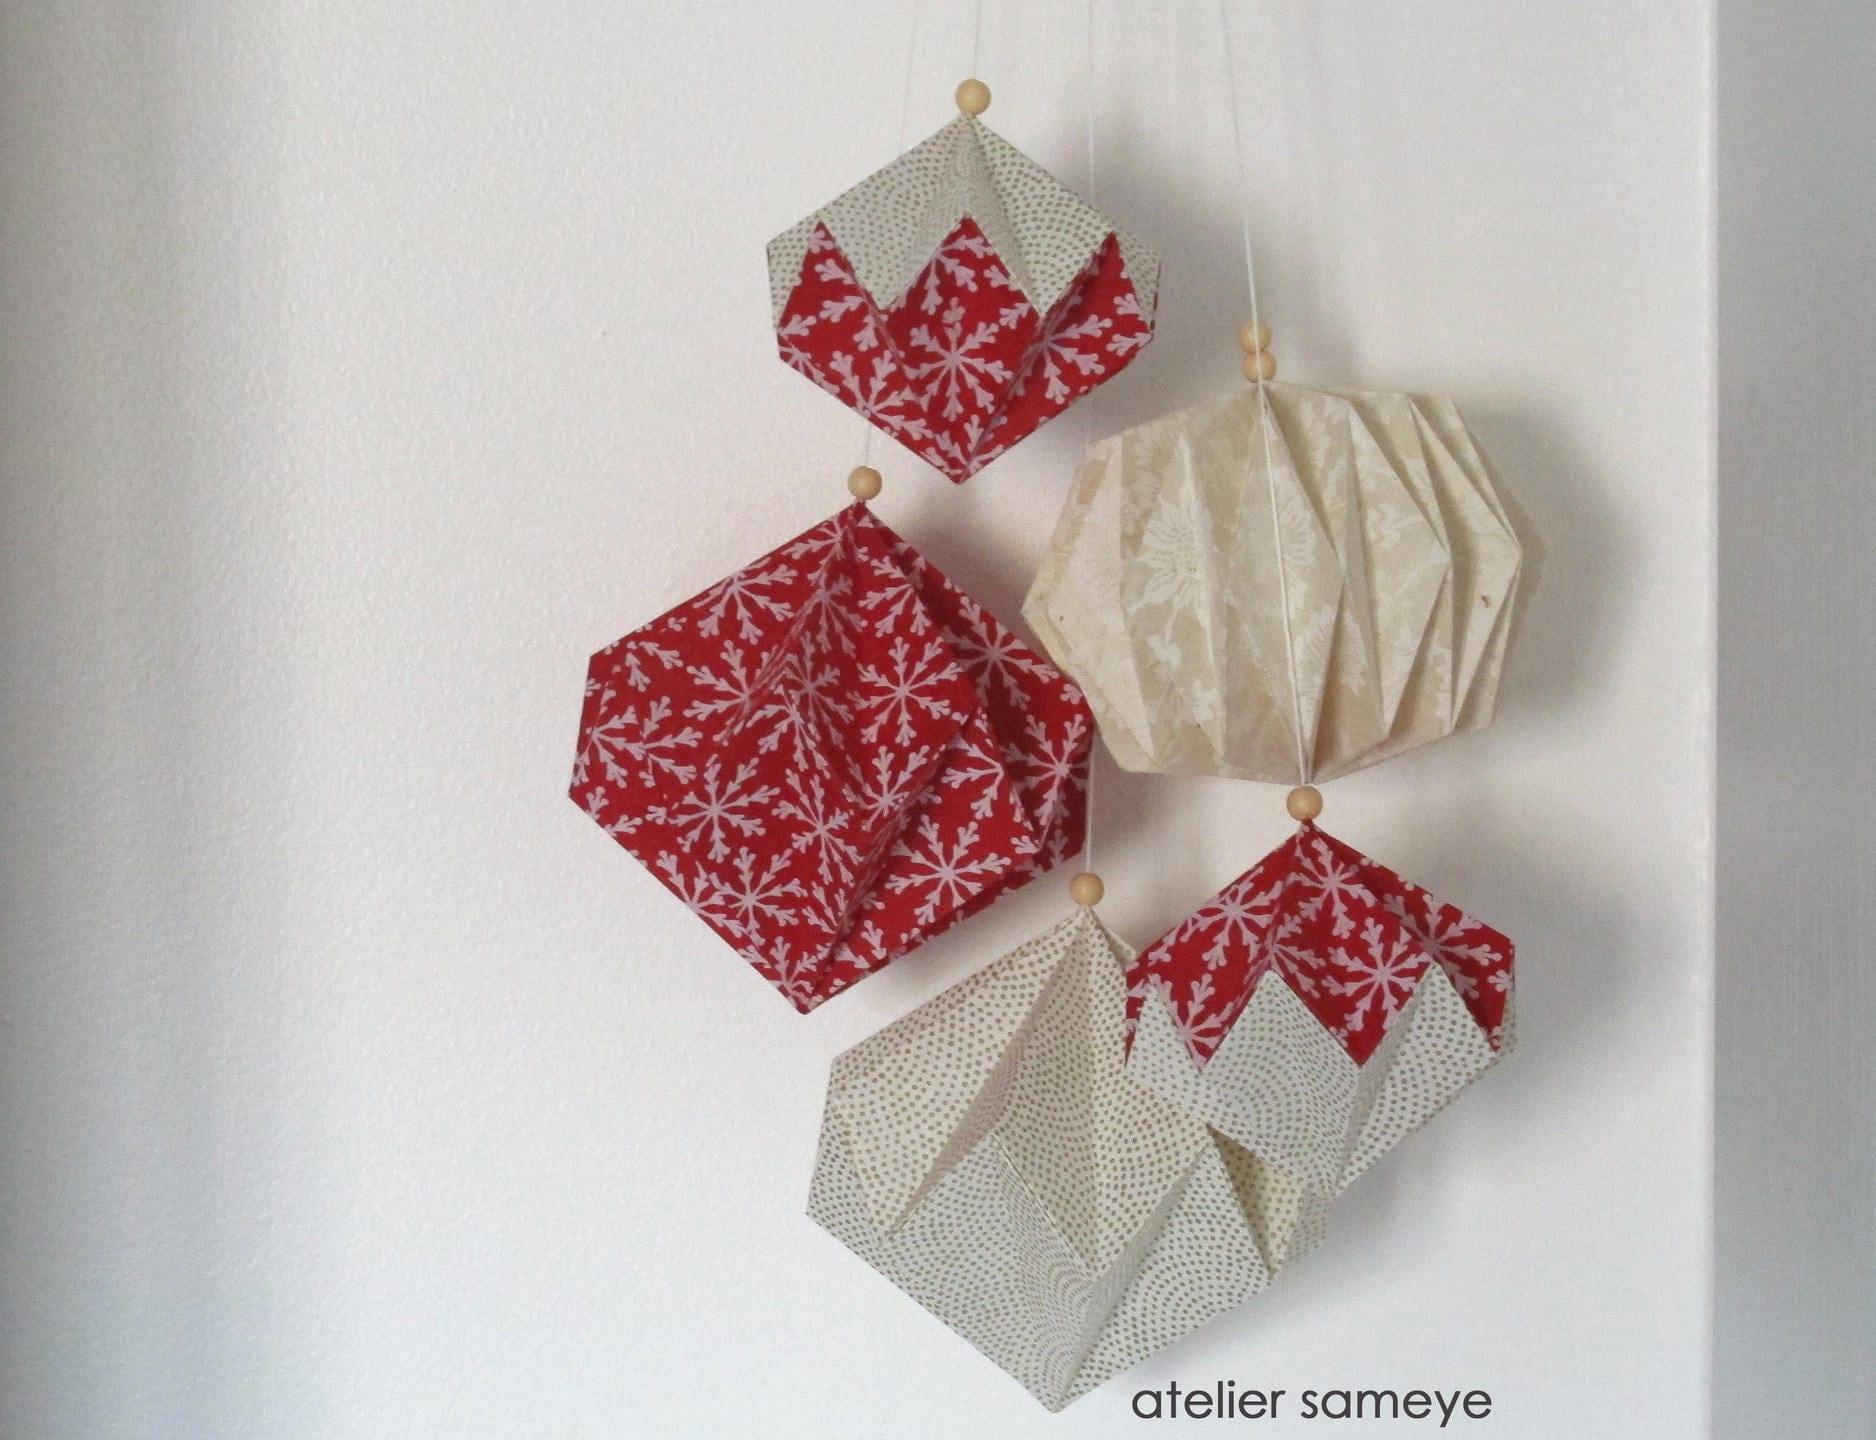 d coration murale grappe diamants origami scandinave etsy. Black Bedroom Furniture Sets. Home Design Ideas